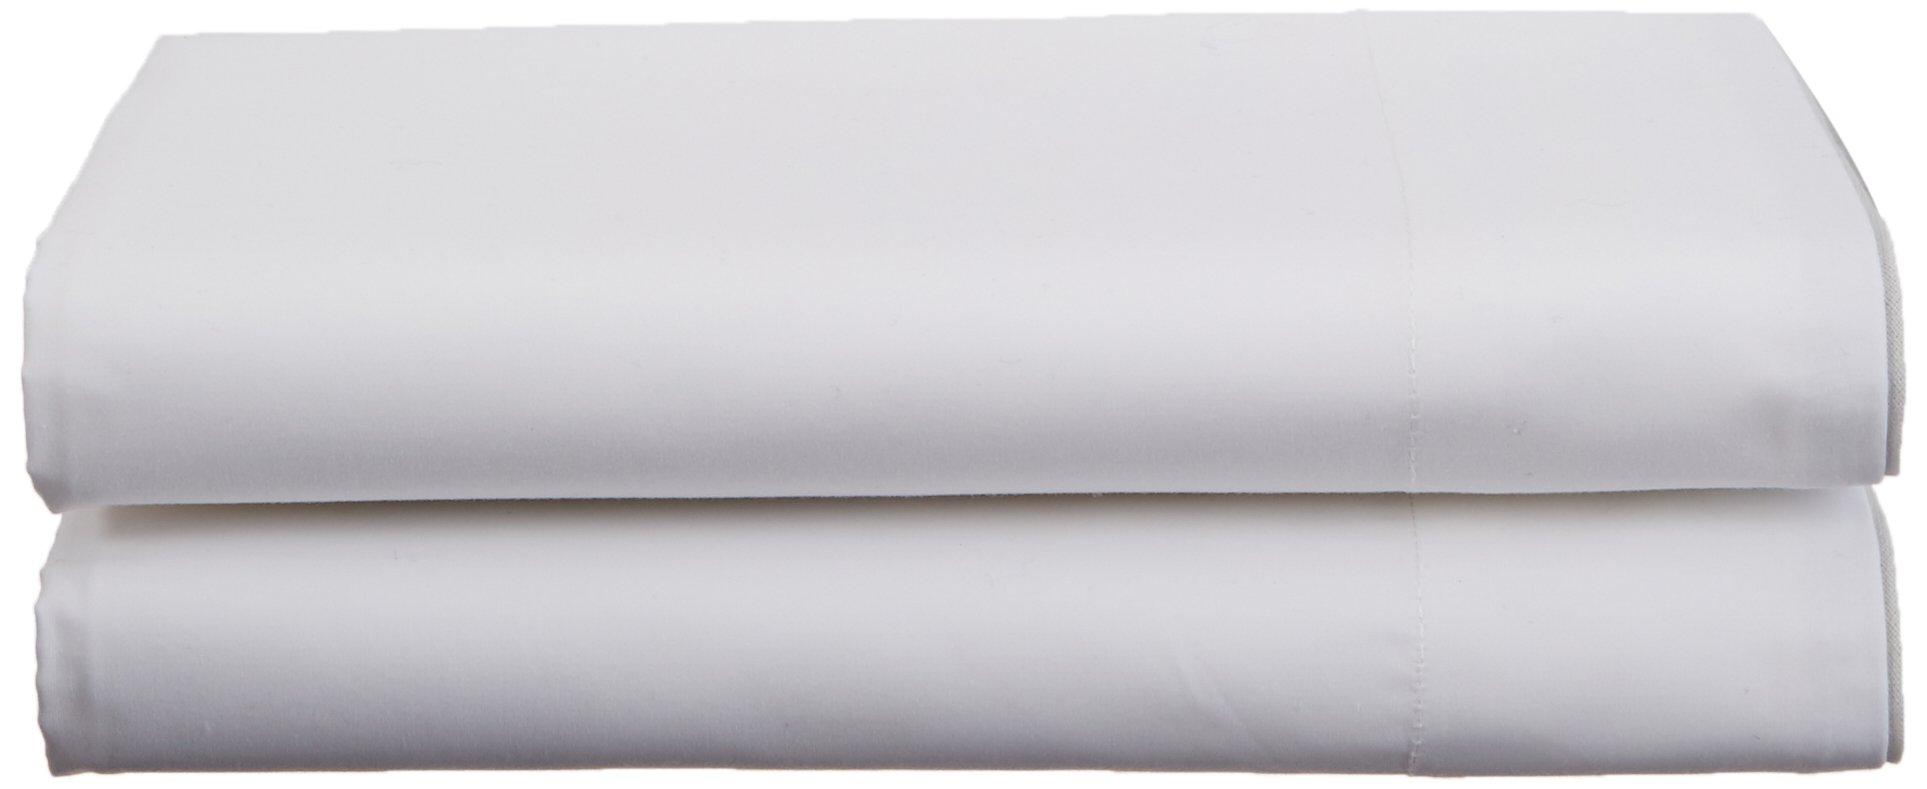 Calvin Klein Home Series 01 Pillowcase, Standard Pair, Grey, 2 Piece